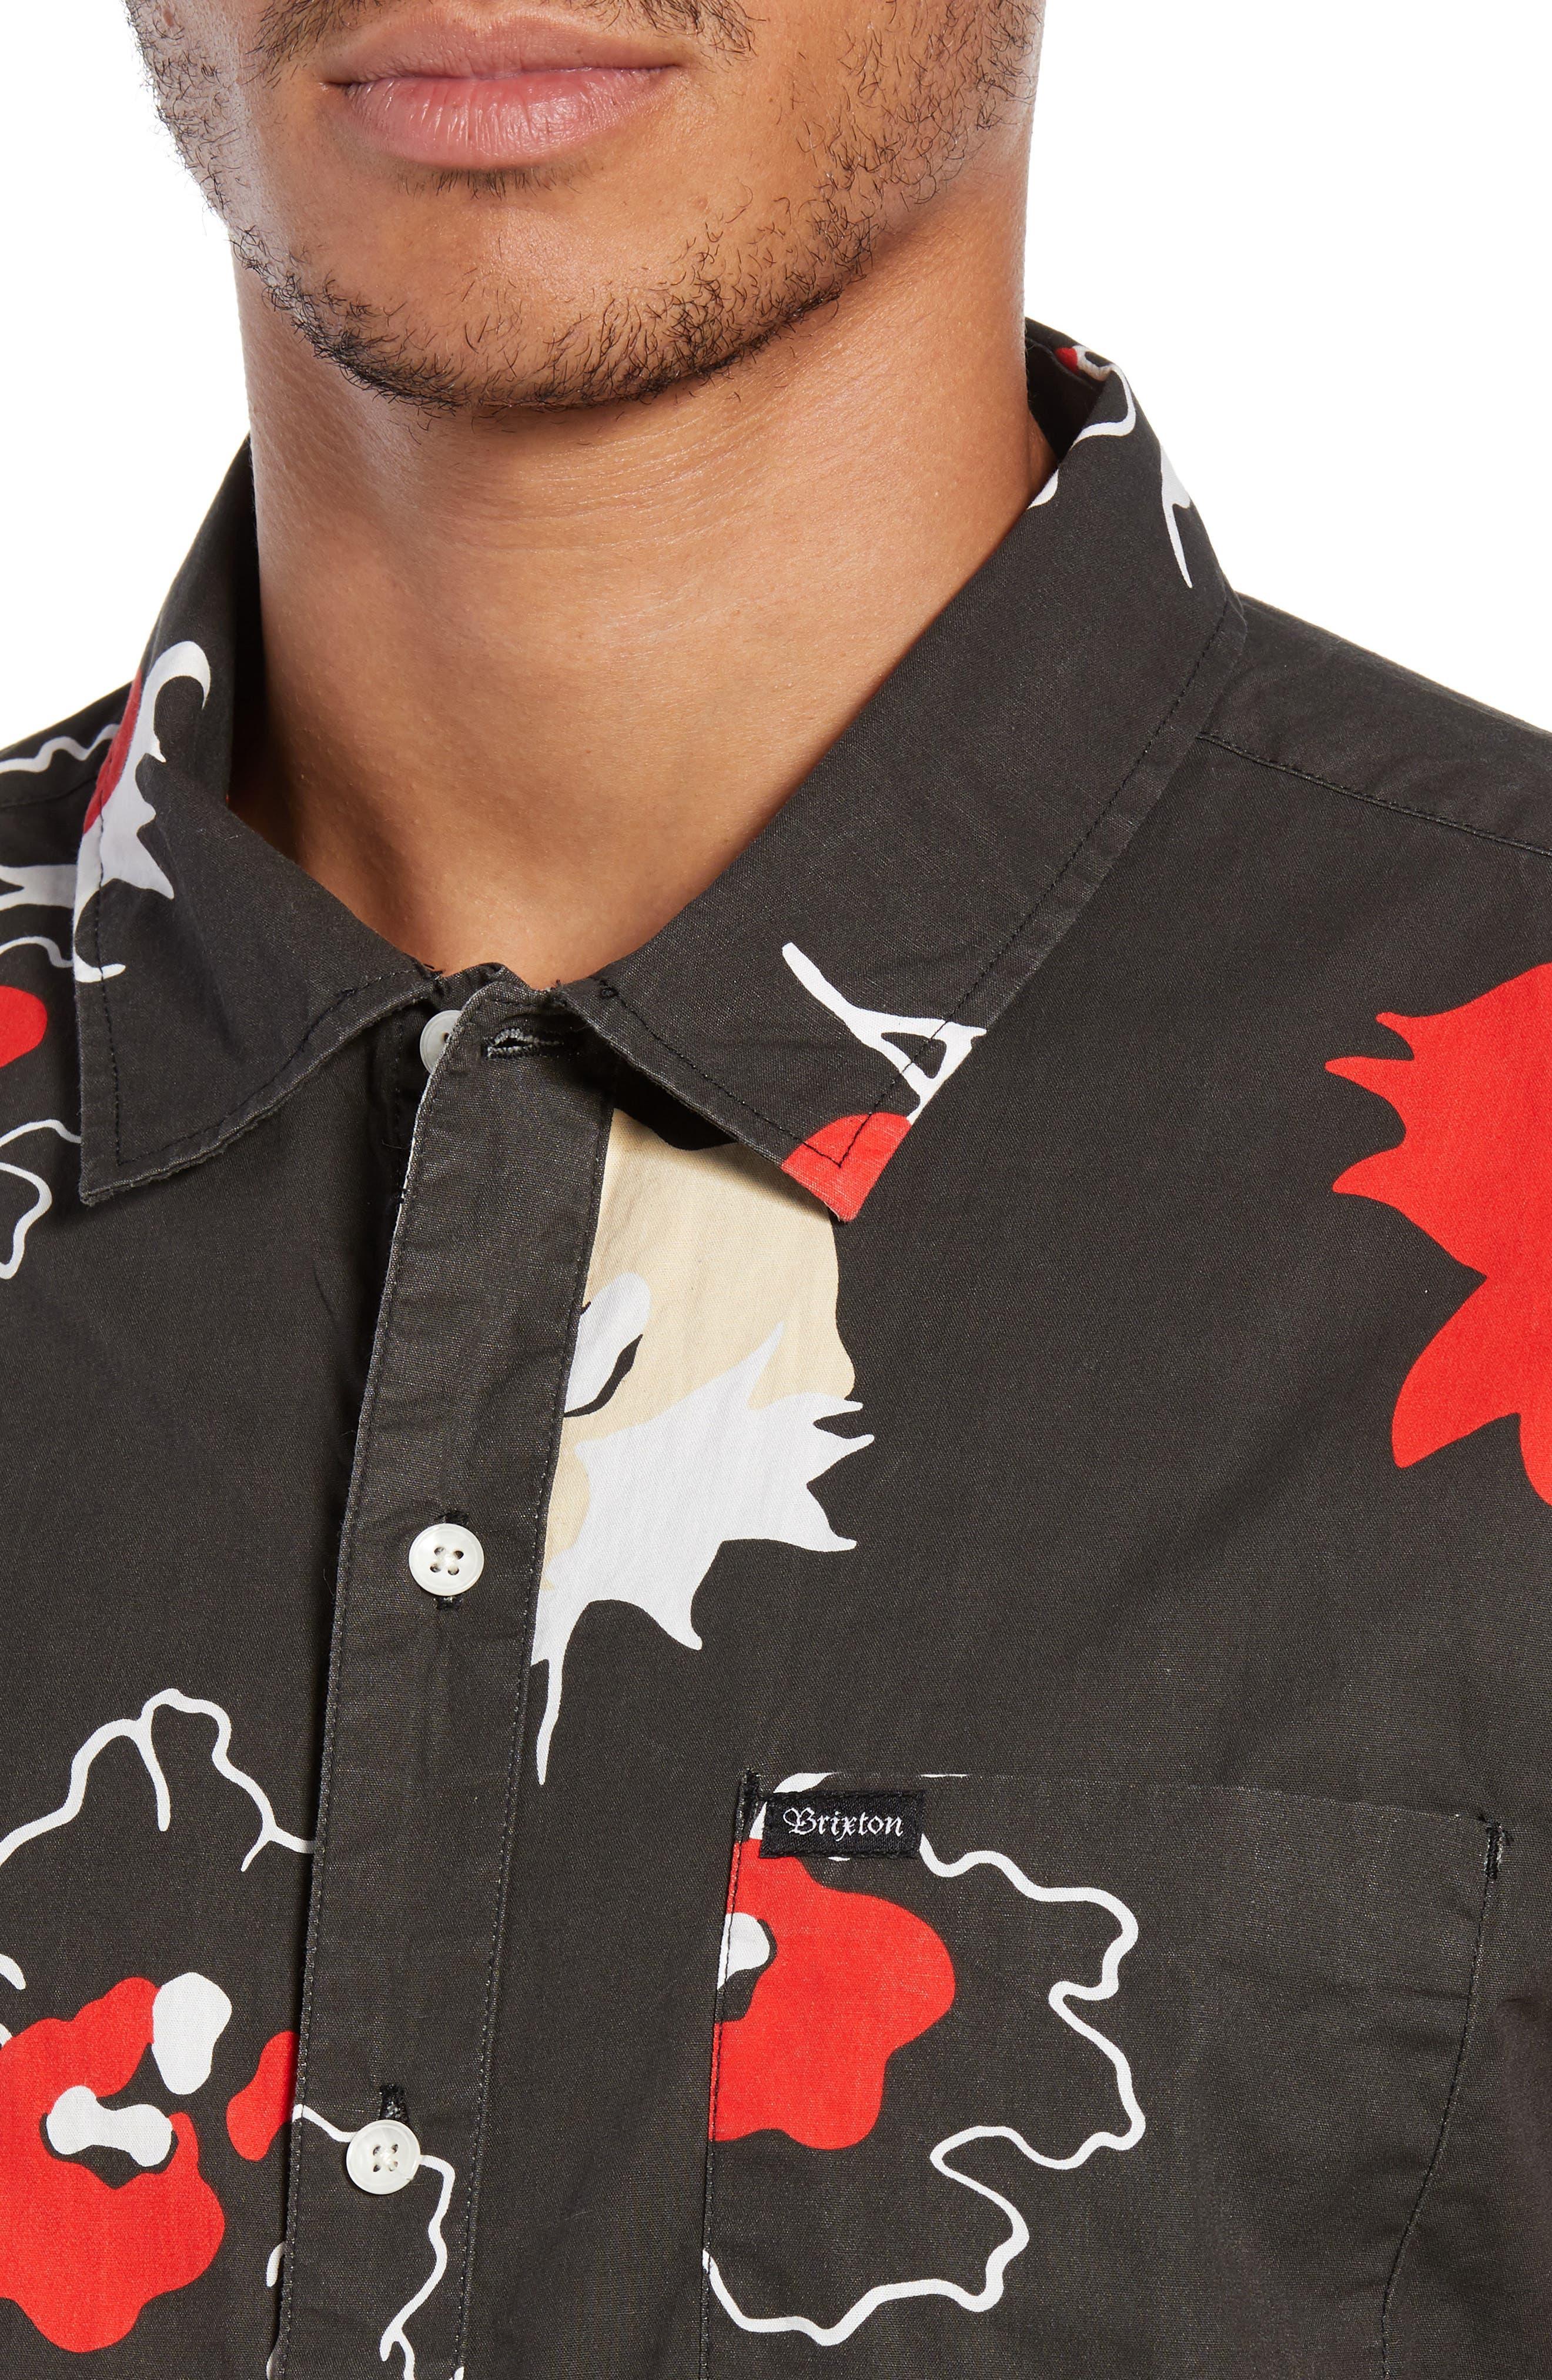 Charter Print Woven Shirt,                             Alternate thumbnail 4, color,                             001